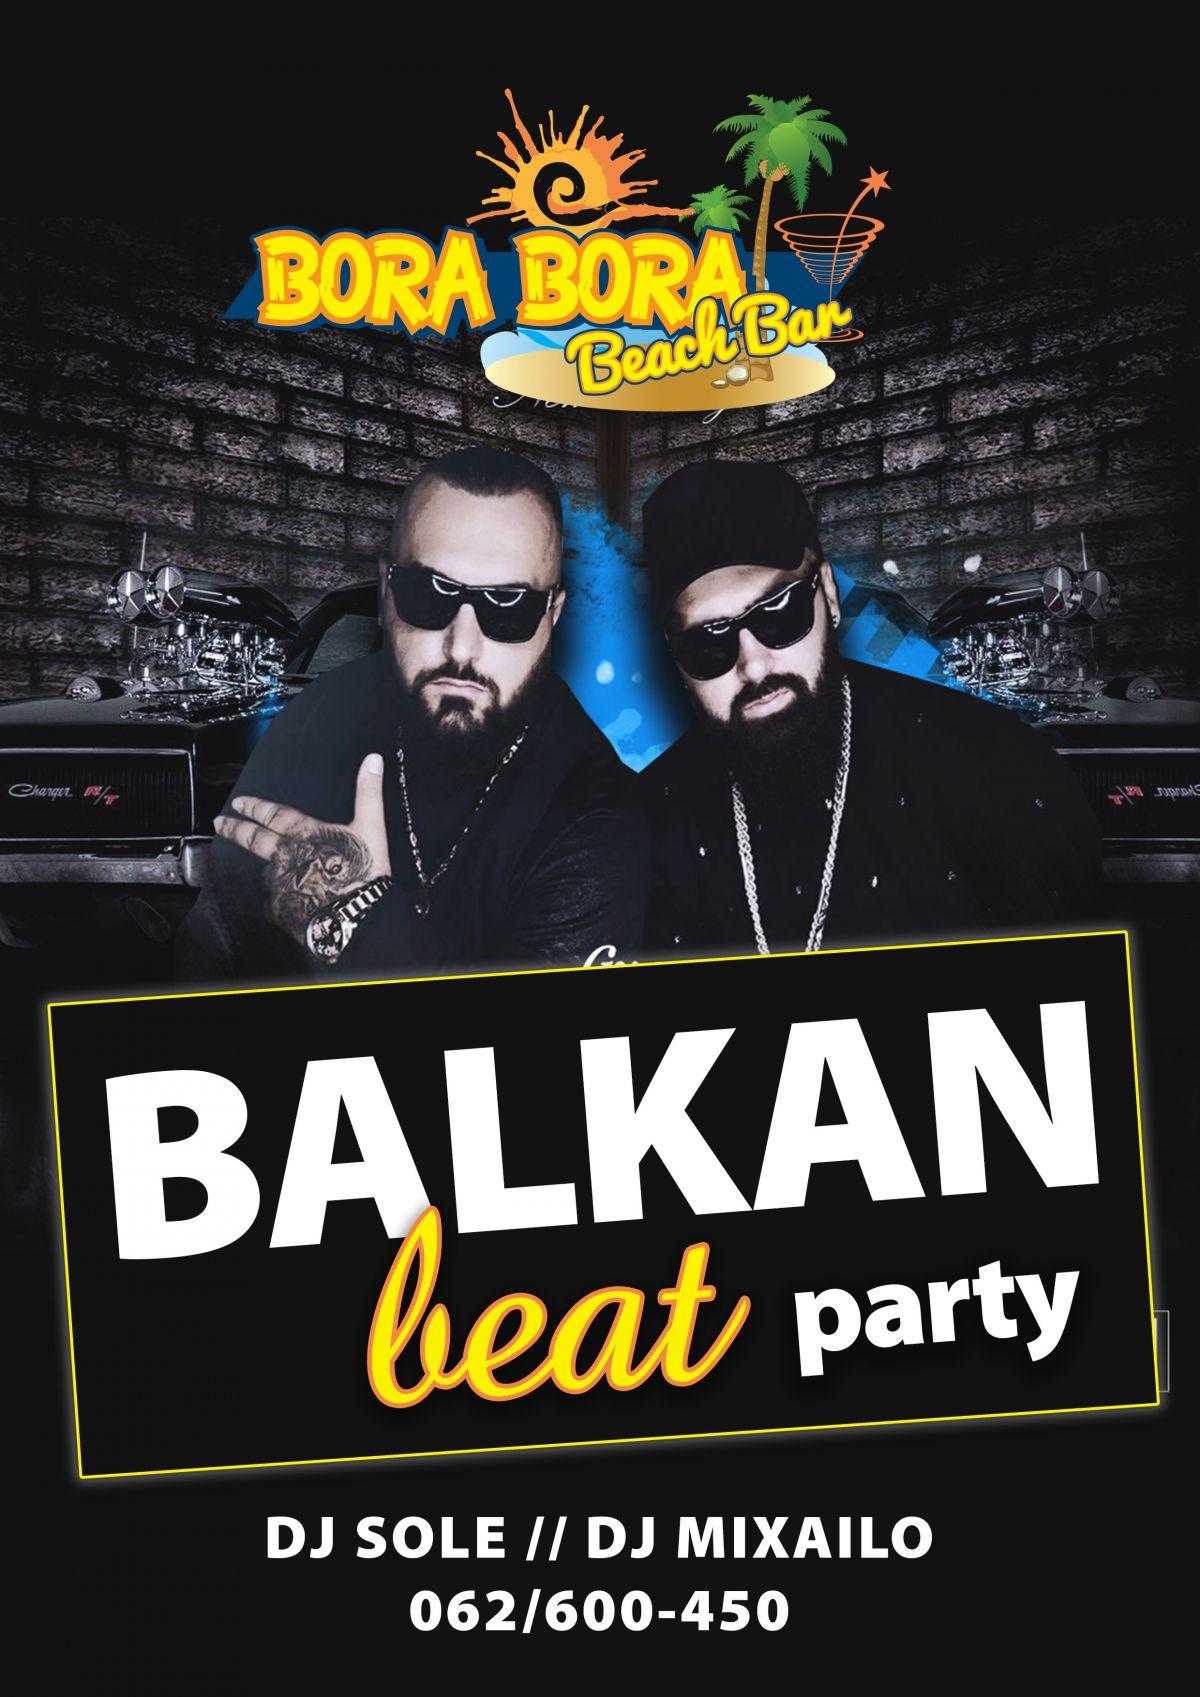 У Бичбару Бора, Бора, вечерас Балкан Бит журка